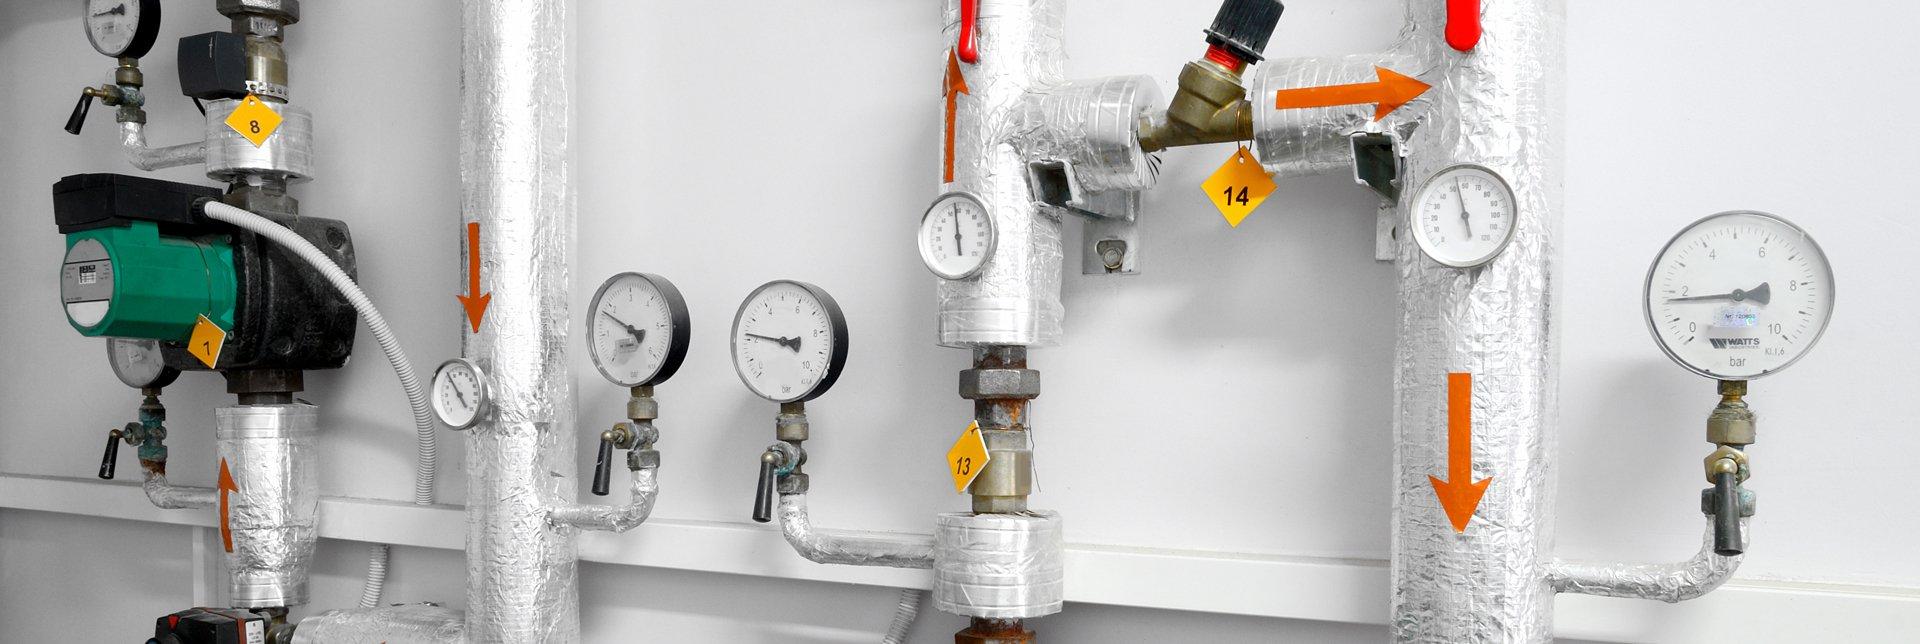 Heating And Furnace Repair Contractors Denver Furnace